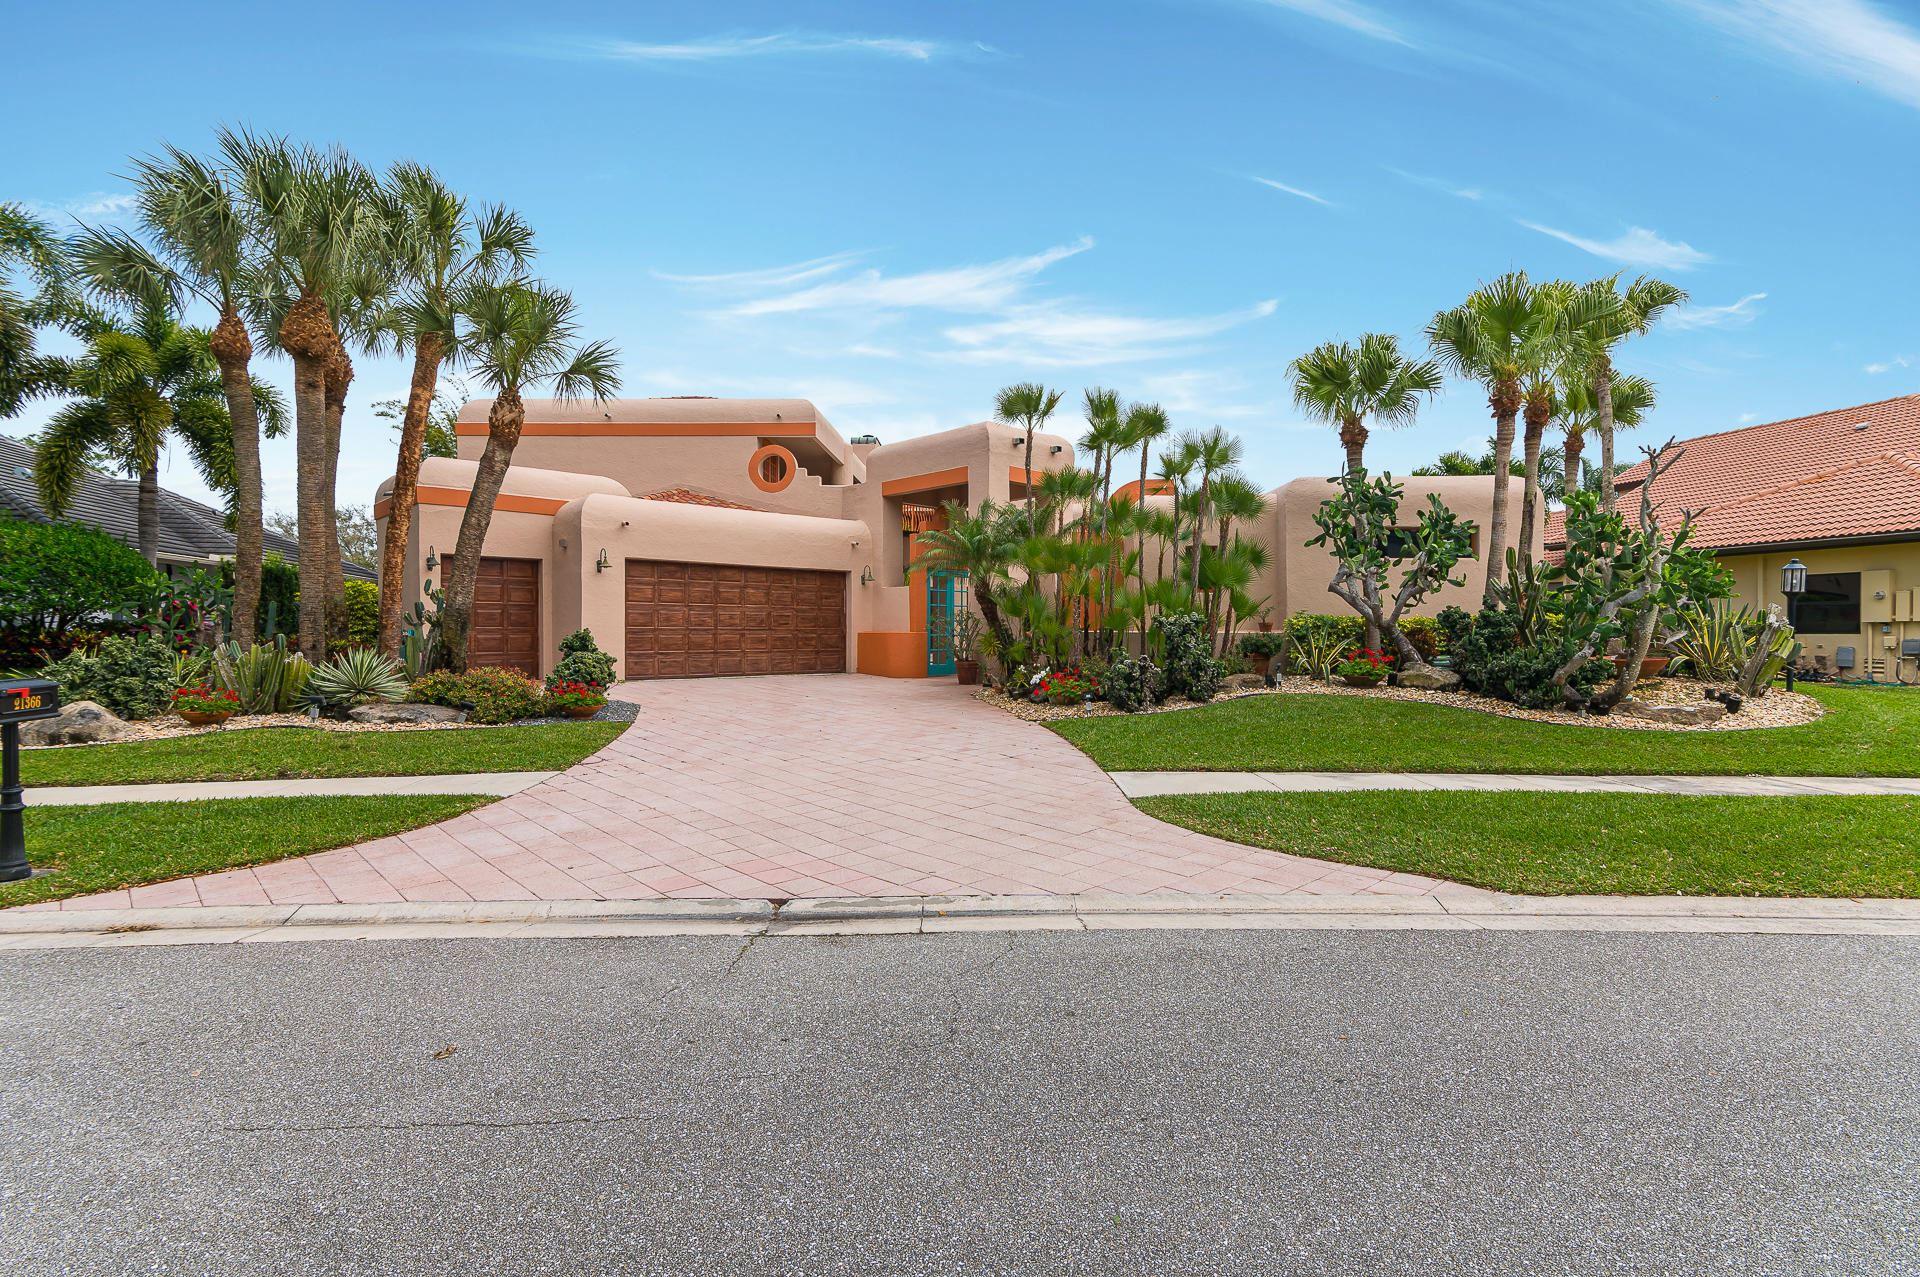 21366 Greenwood Court, Boca Raton, FL 33433 - #: RX-10625234